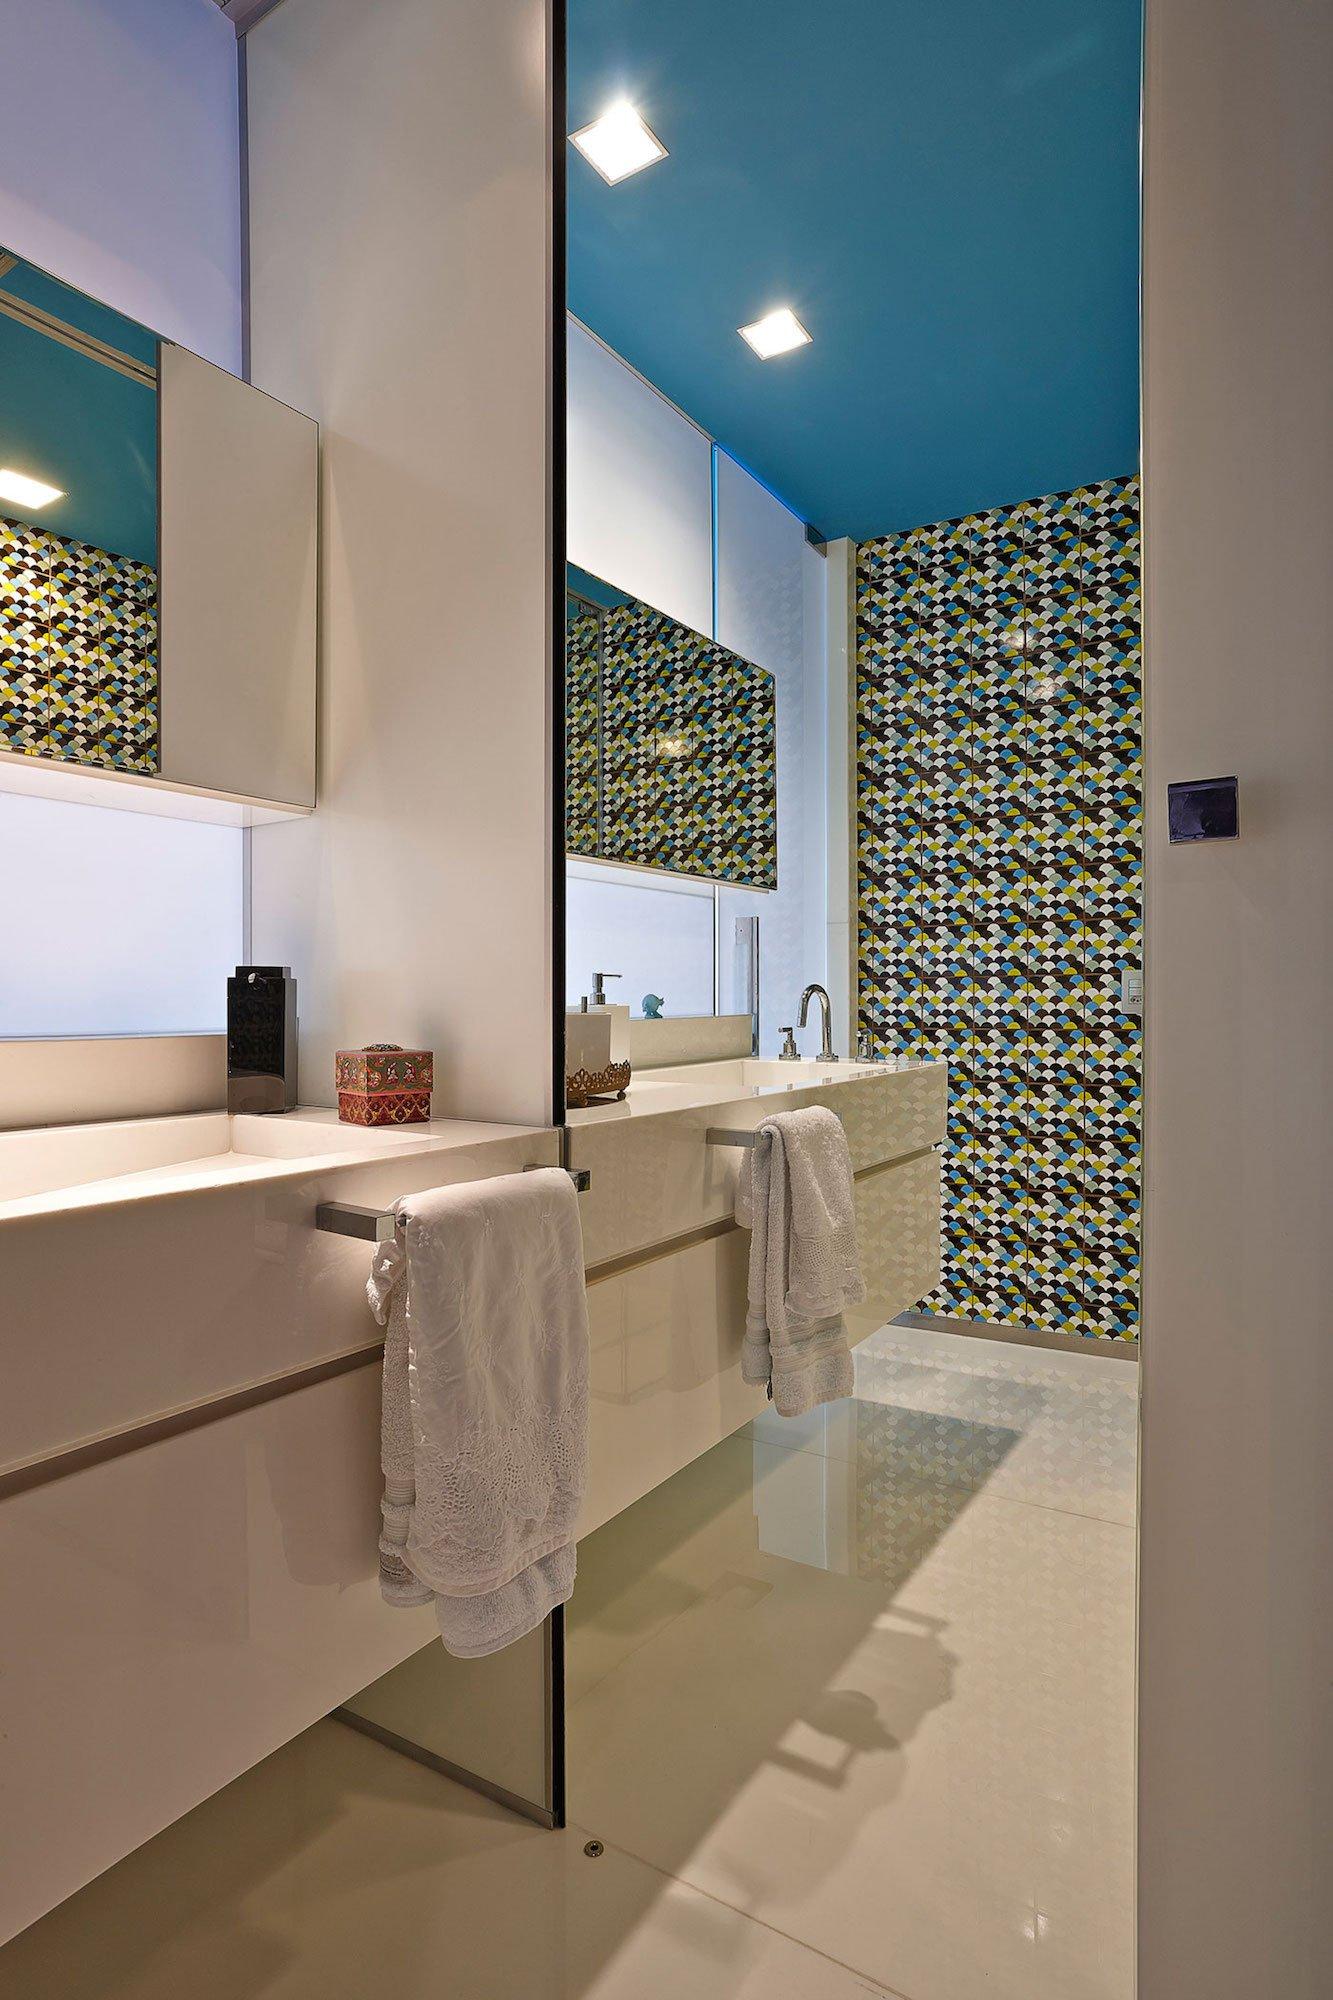 Apartment-in-Belo-Horizonte-23